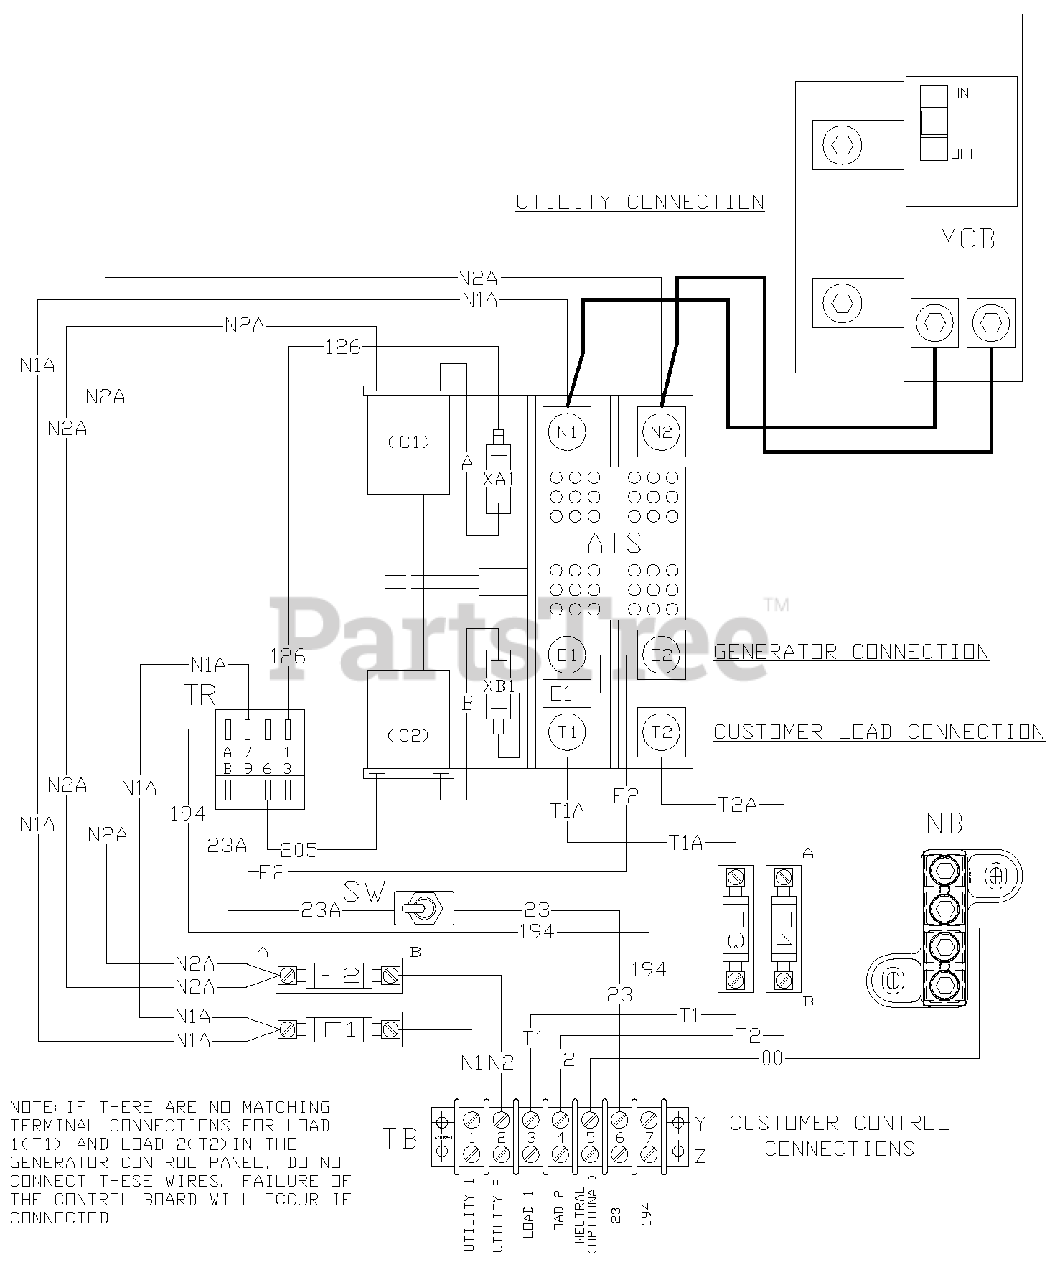 Generac Transfer Switch Wiring Diagram from www.partstree.com